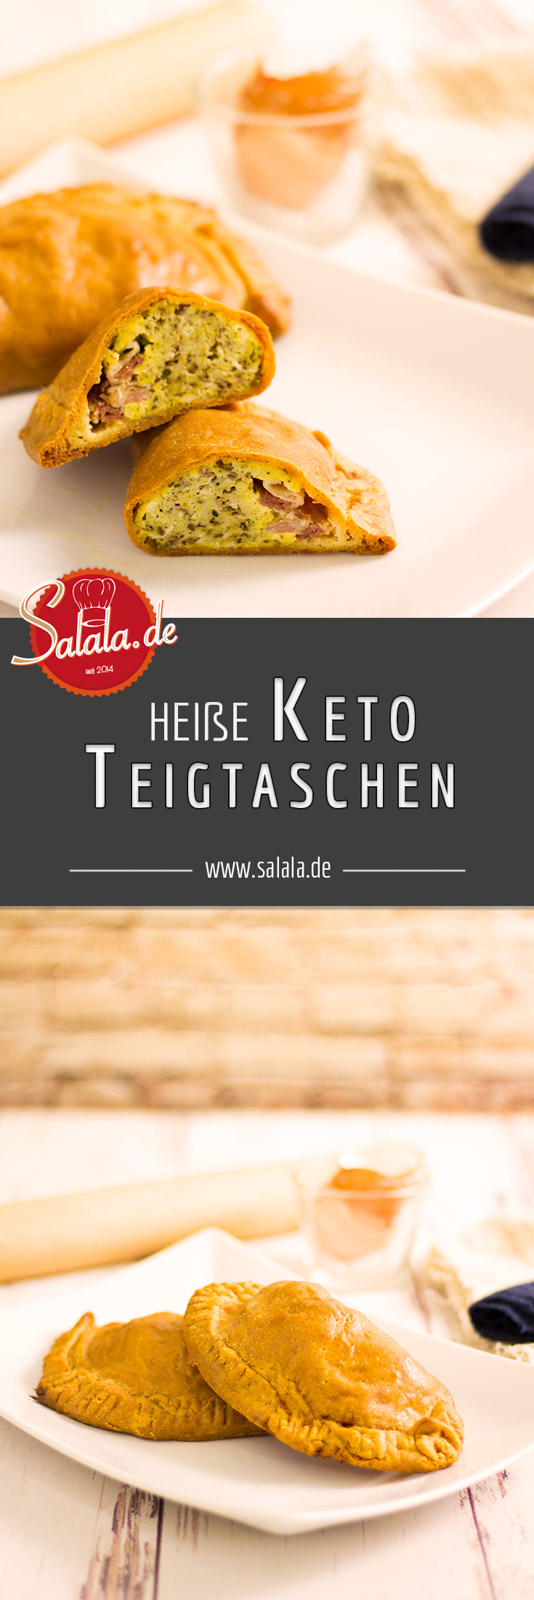 Heiße Keto Teigtaschen - by salala.de - ohne Mehl Low Carb Rezept mit Fathead Teig